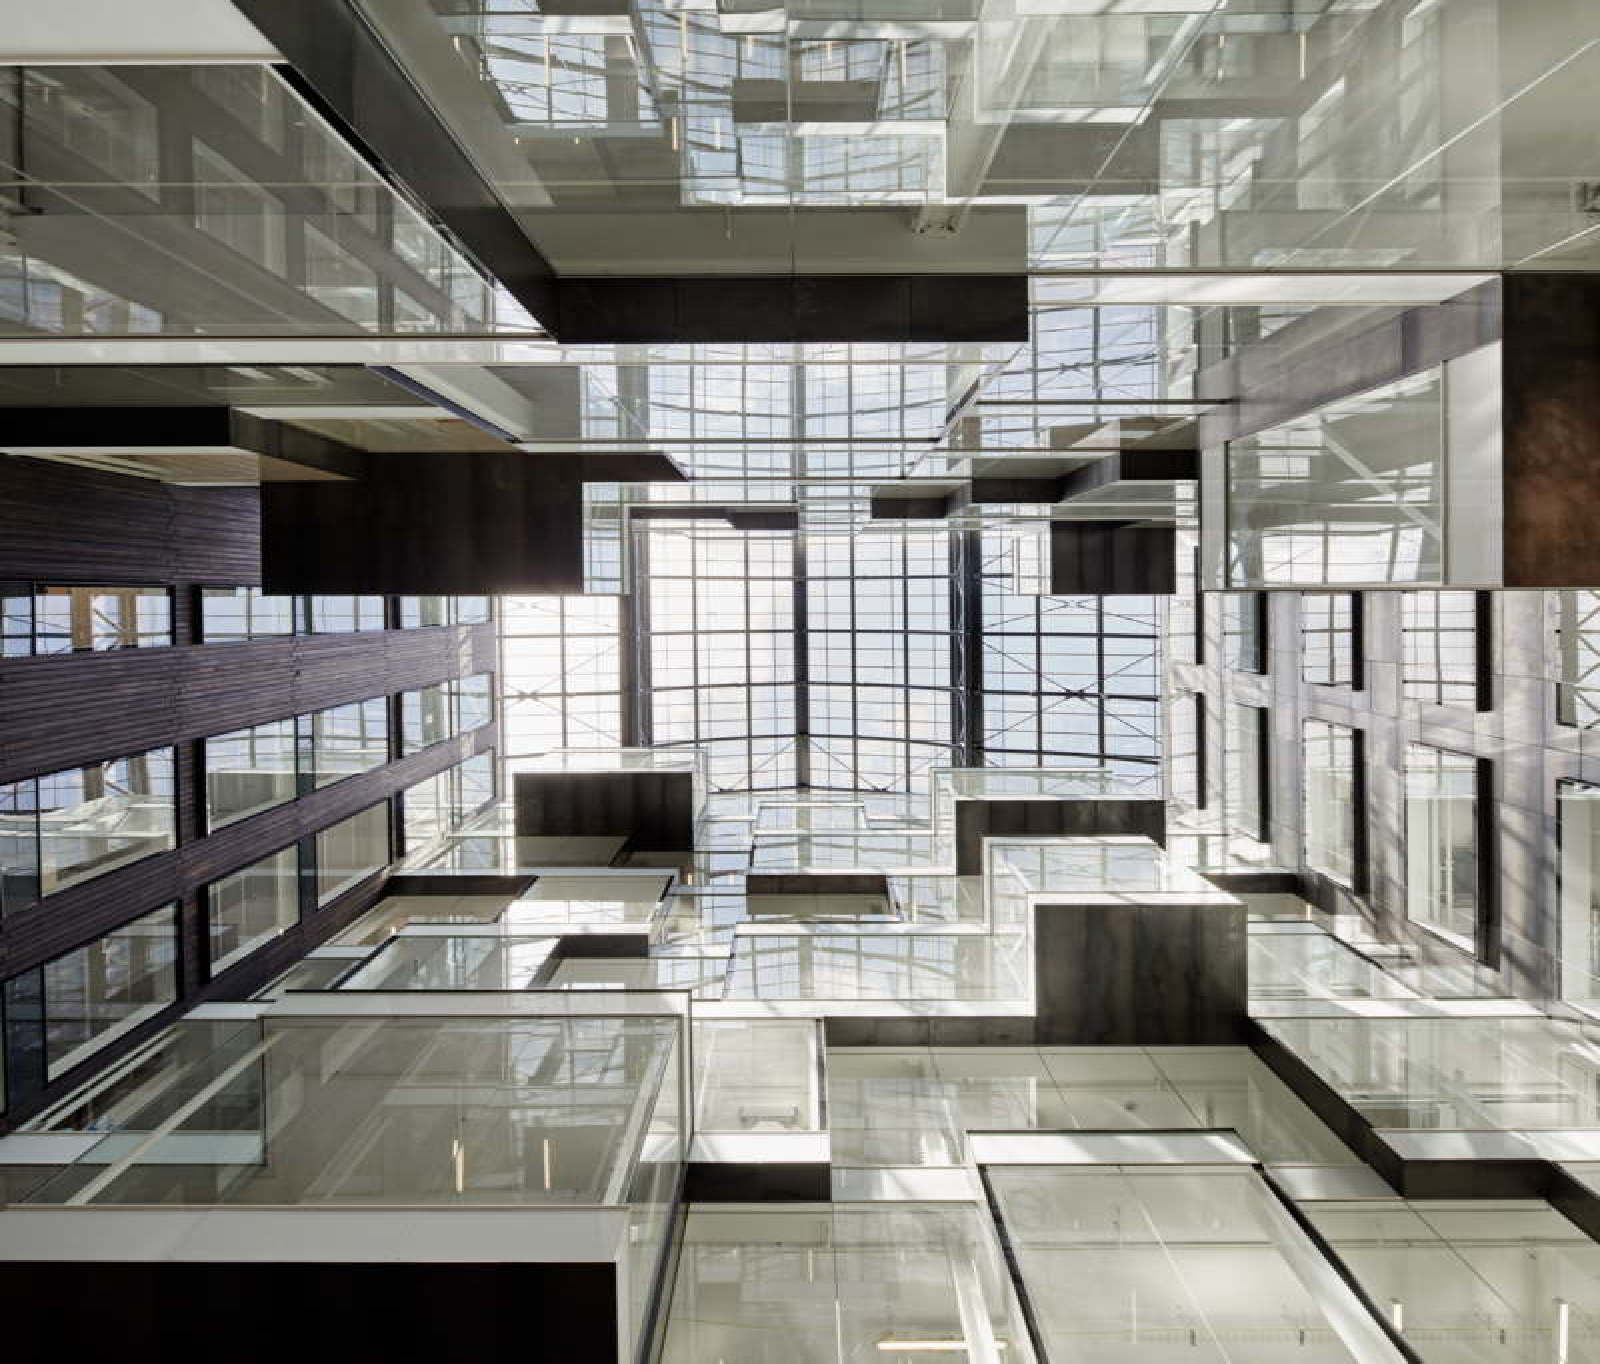 London Studio Rhe Transforms A Historic Building Into